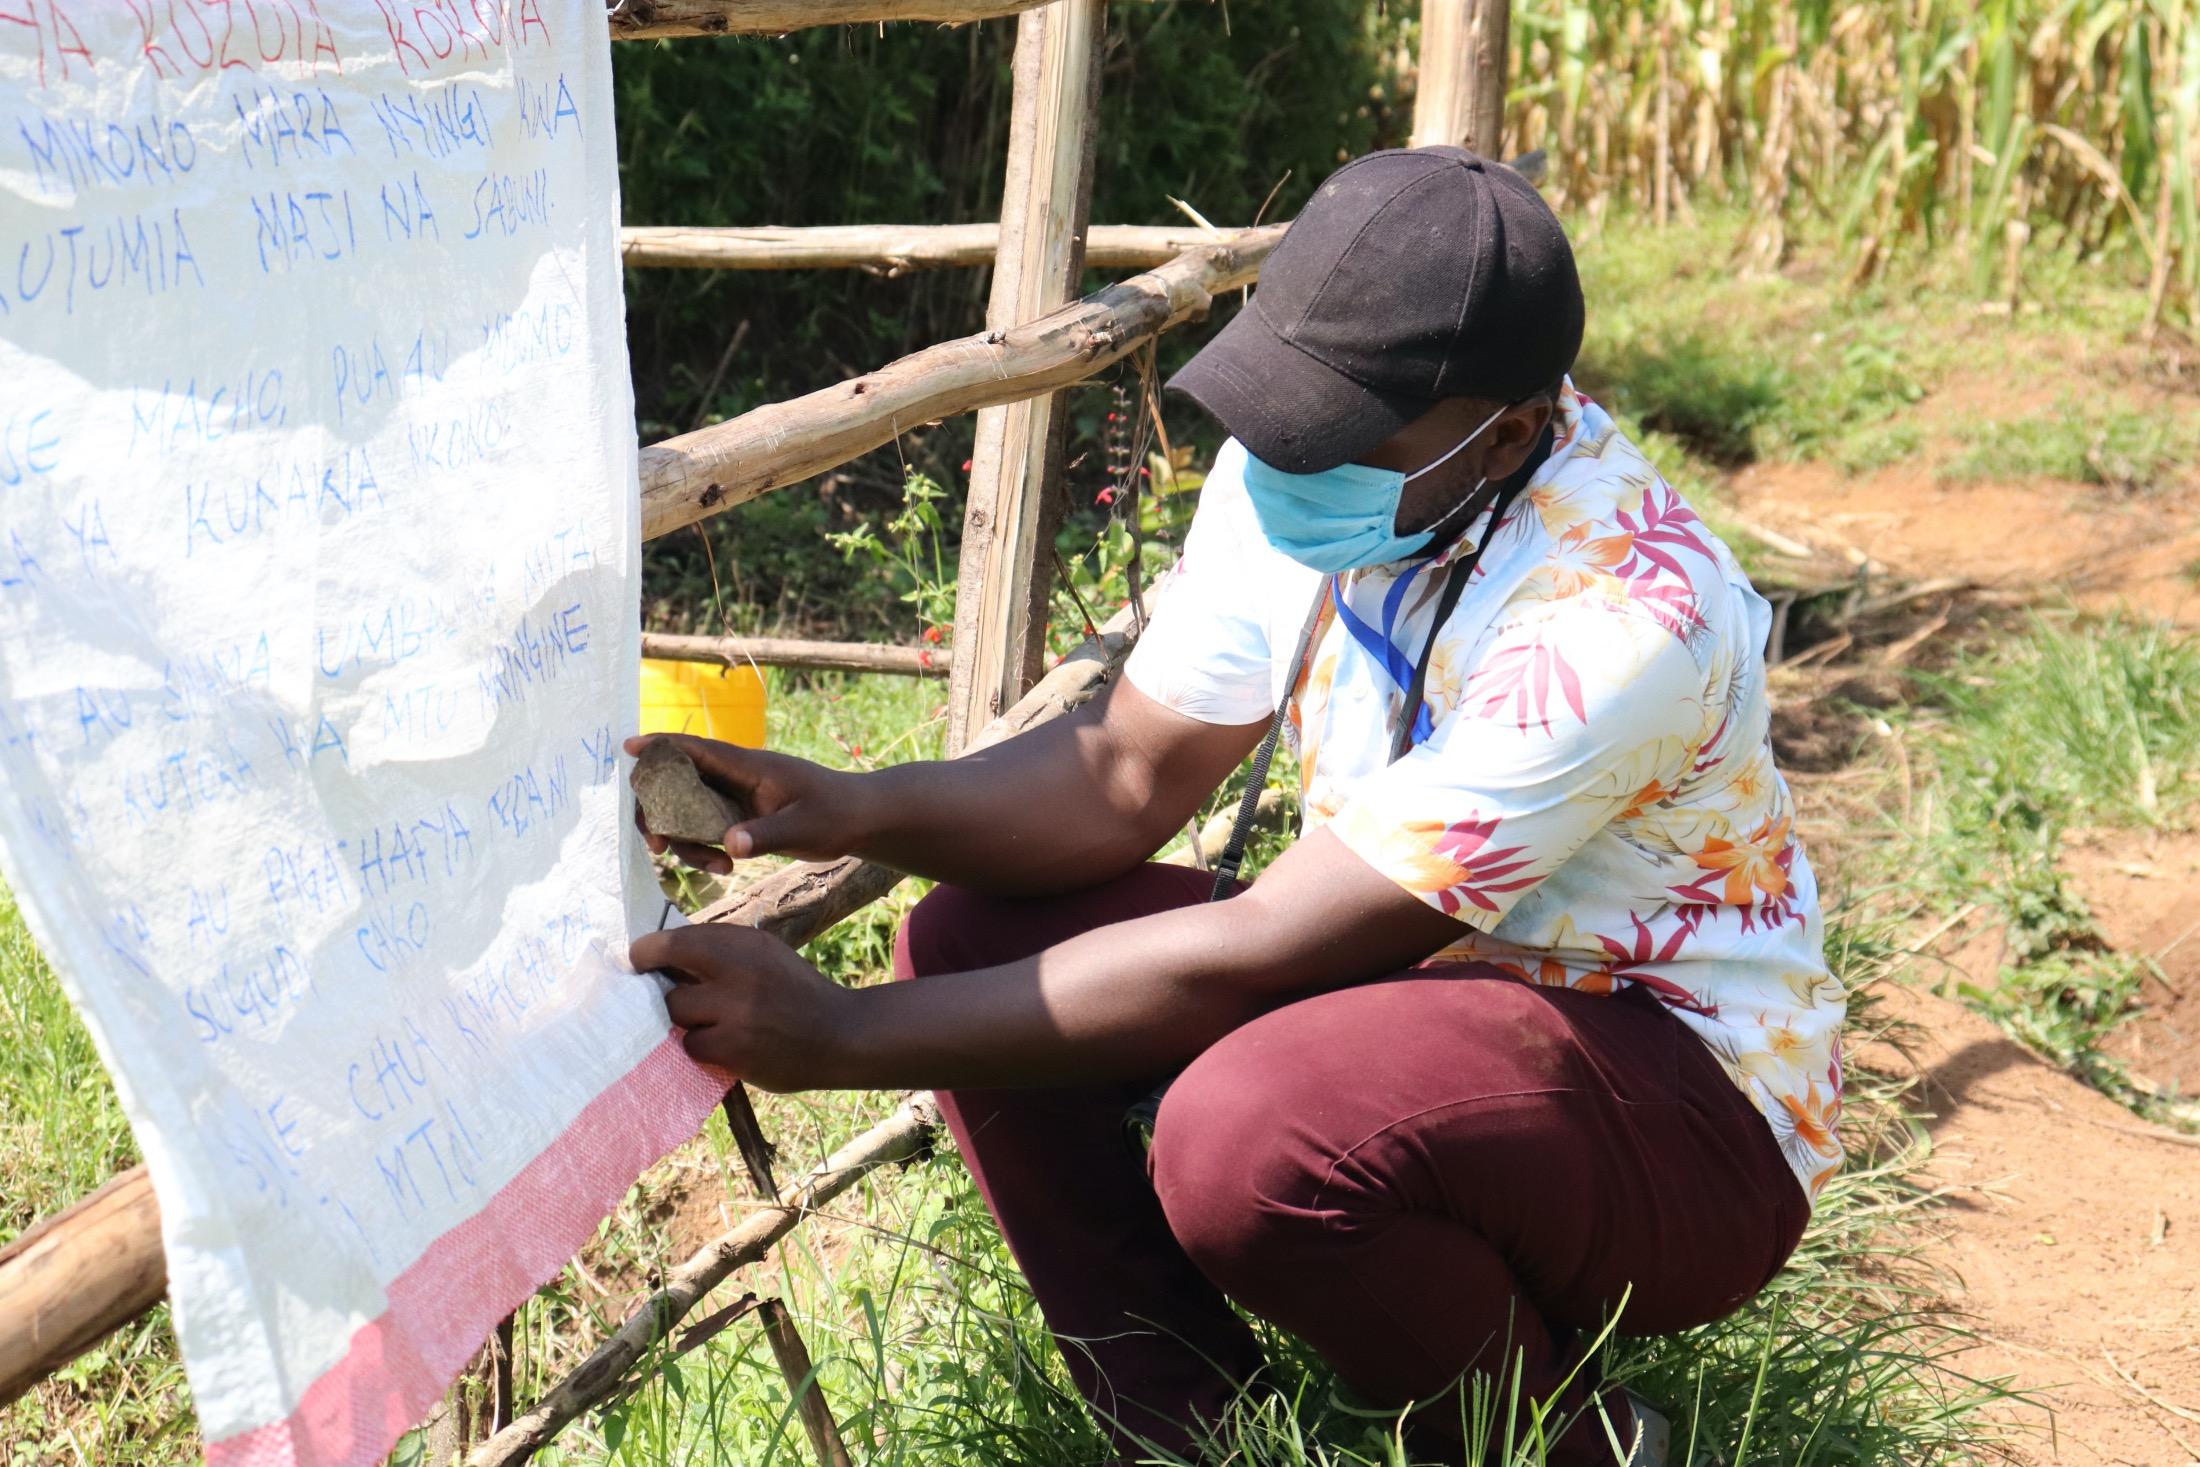 The Water Project : covid19-kenya20162-sir-allan-mounting-the-chart-on-the-poles-at-jairus-mwera-spring-1